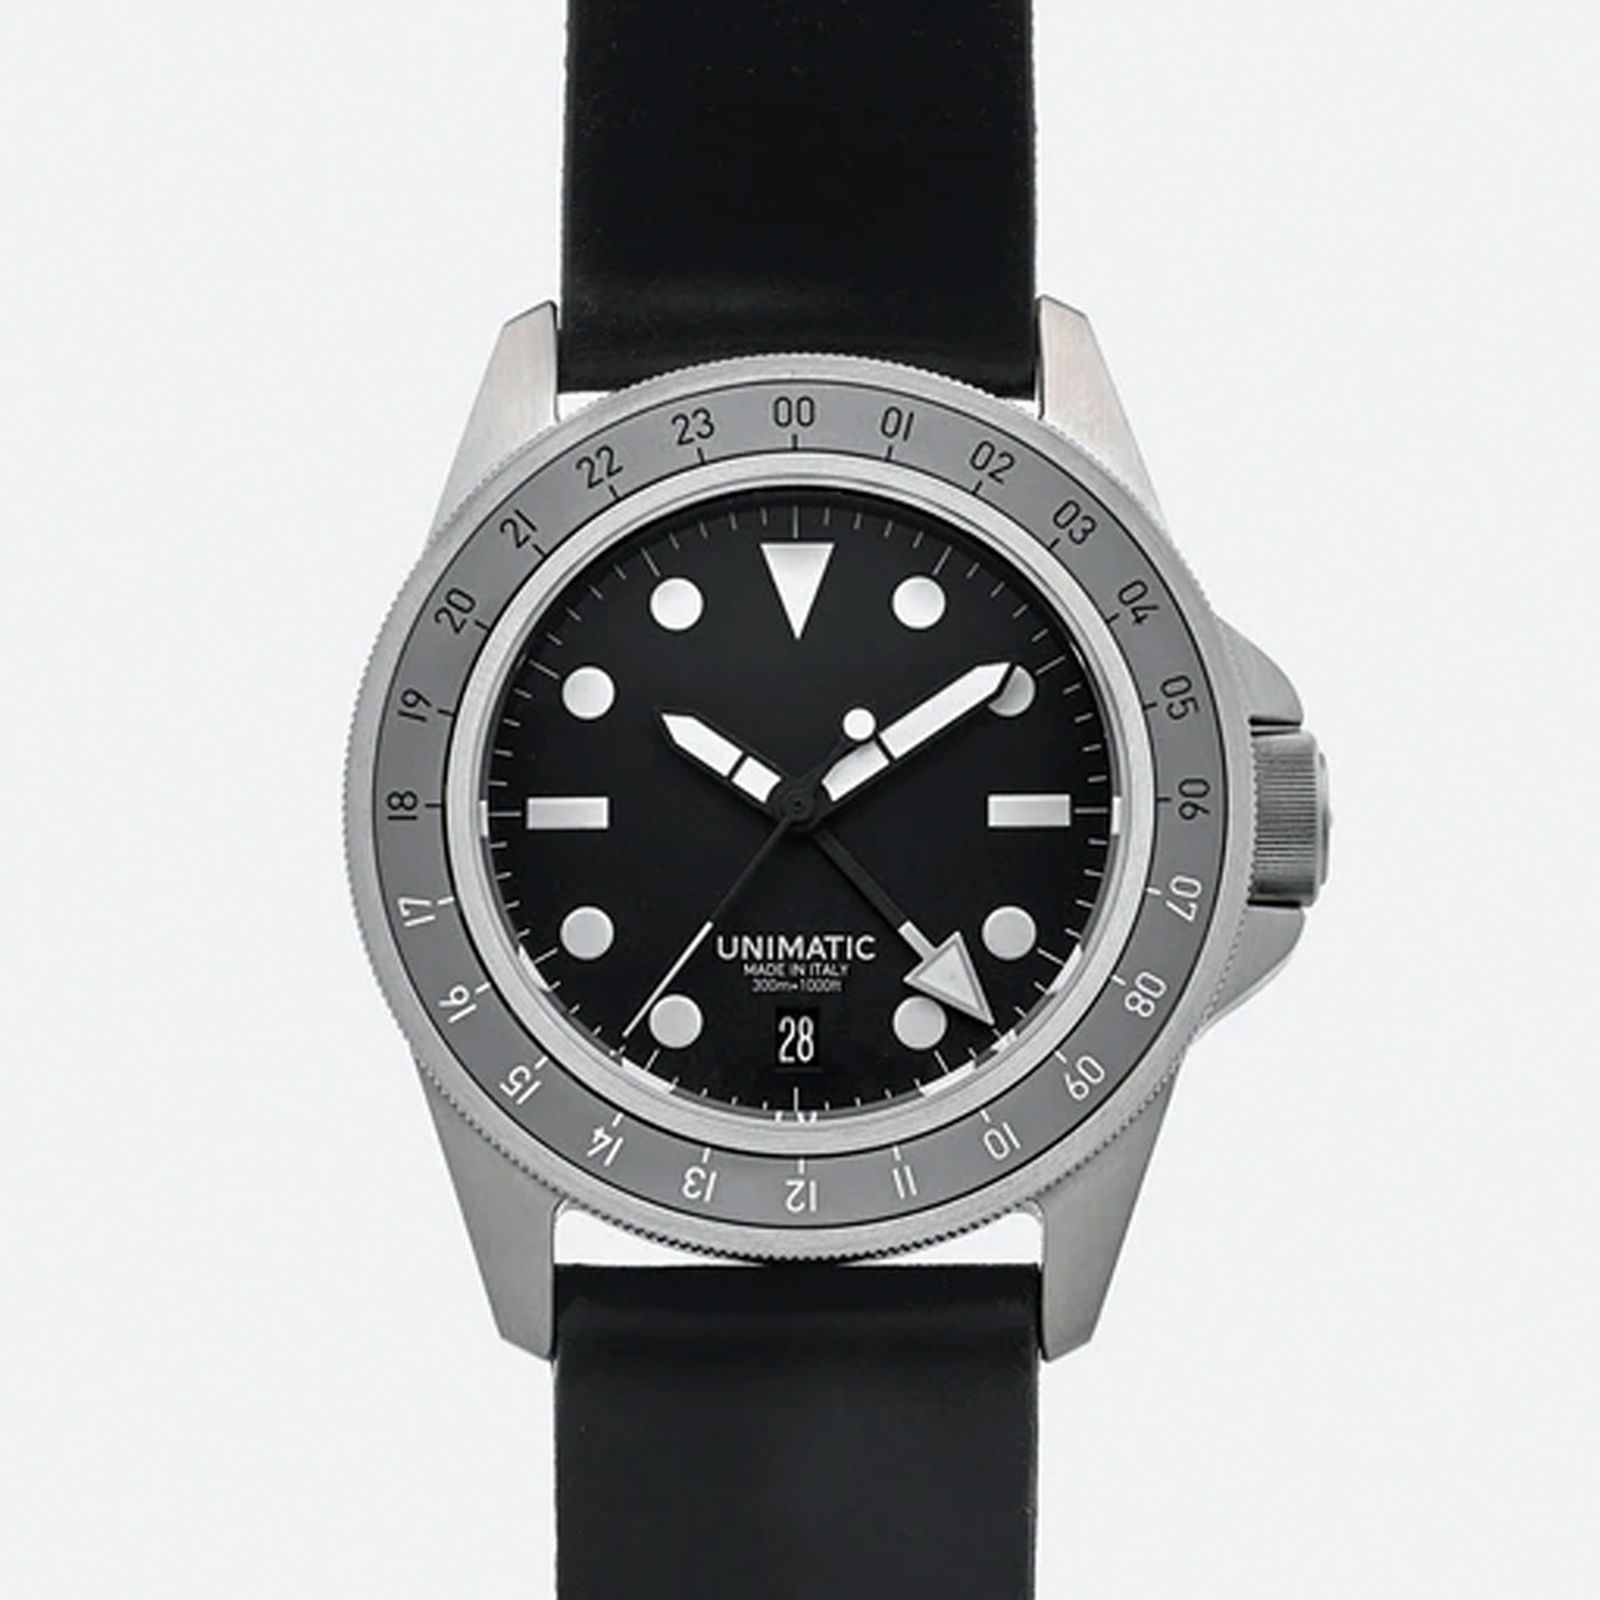 hodinkee-unimatic-price-release-date-03